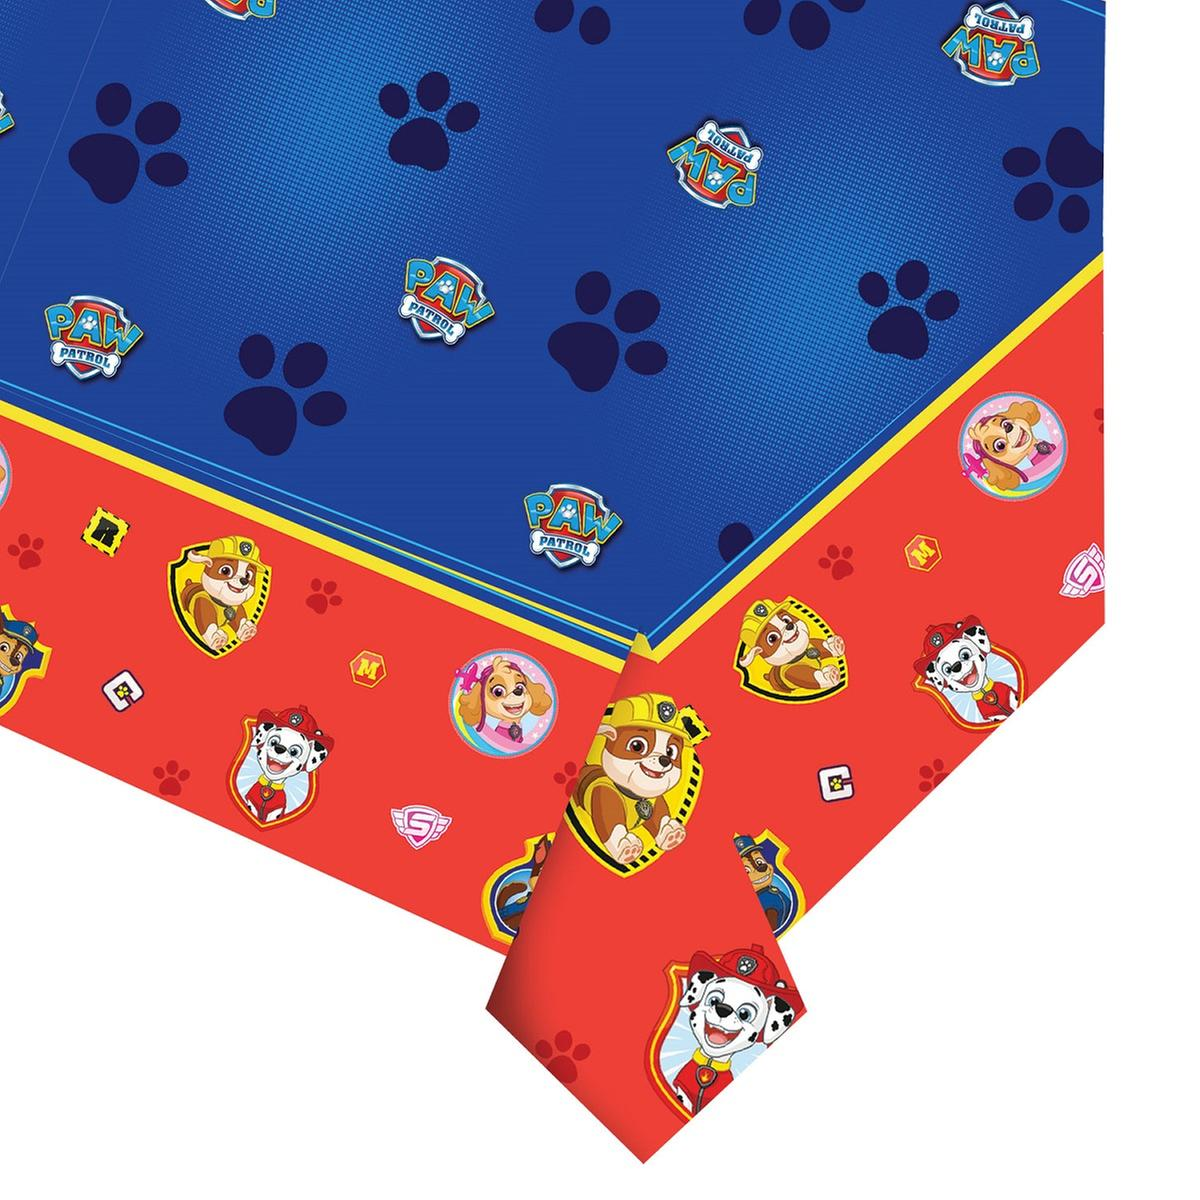 42 x 33 cm Mantel Rectangular PAW PATROL Estera de Tabla Patrulla Canina